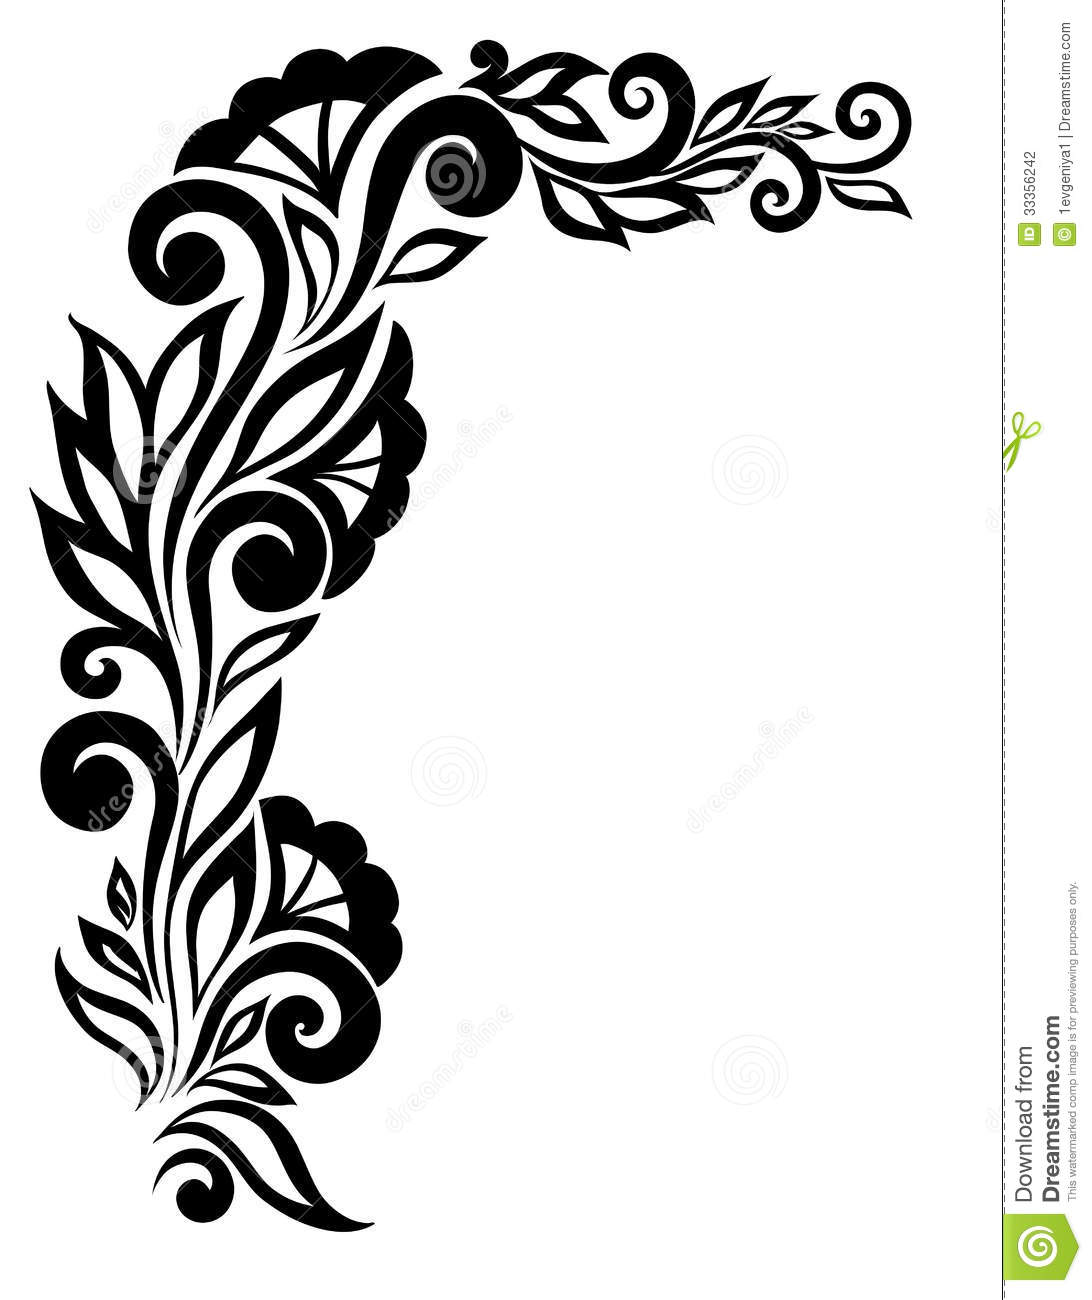 Black and White Corner Border Designs